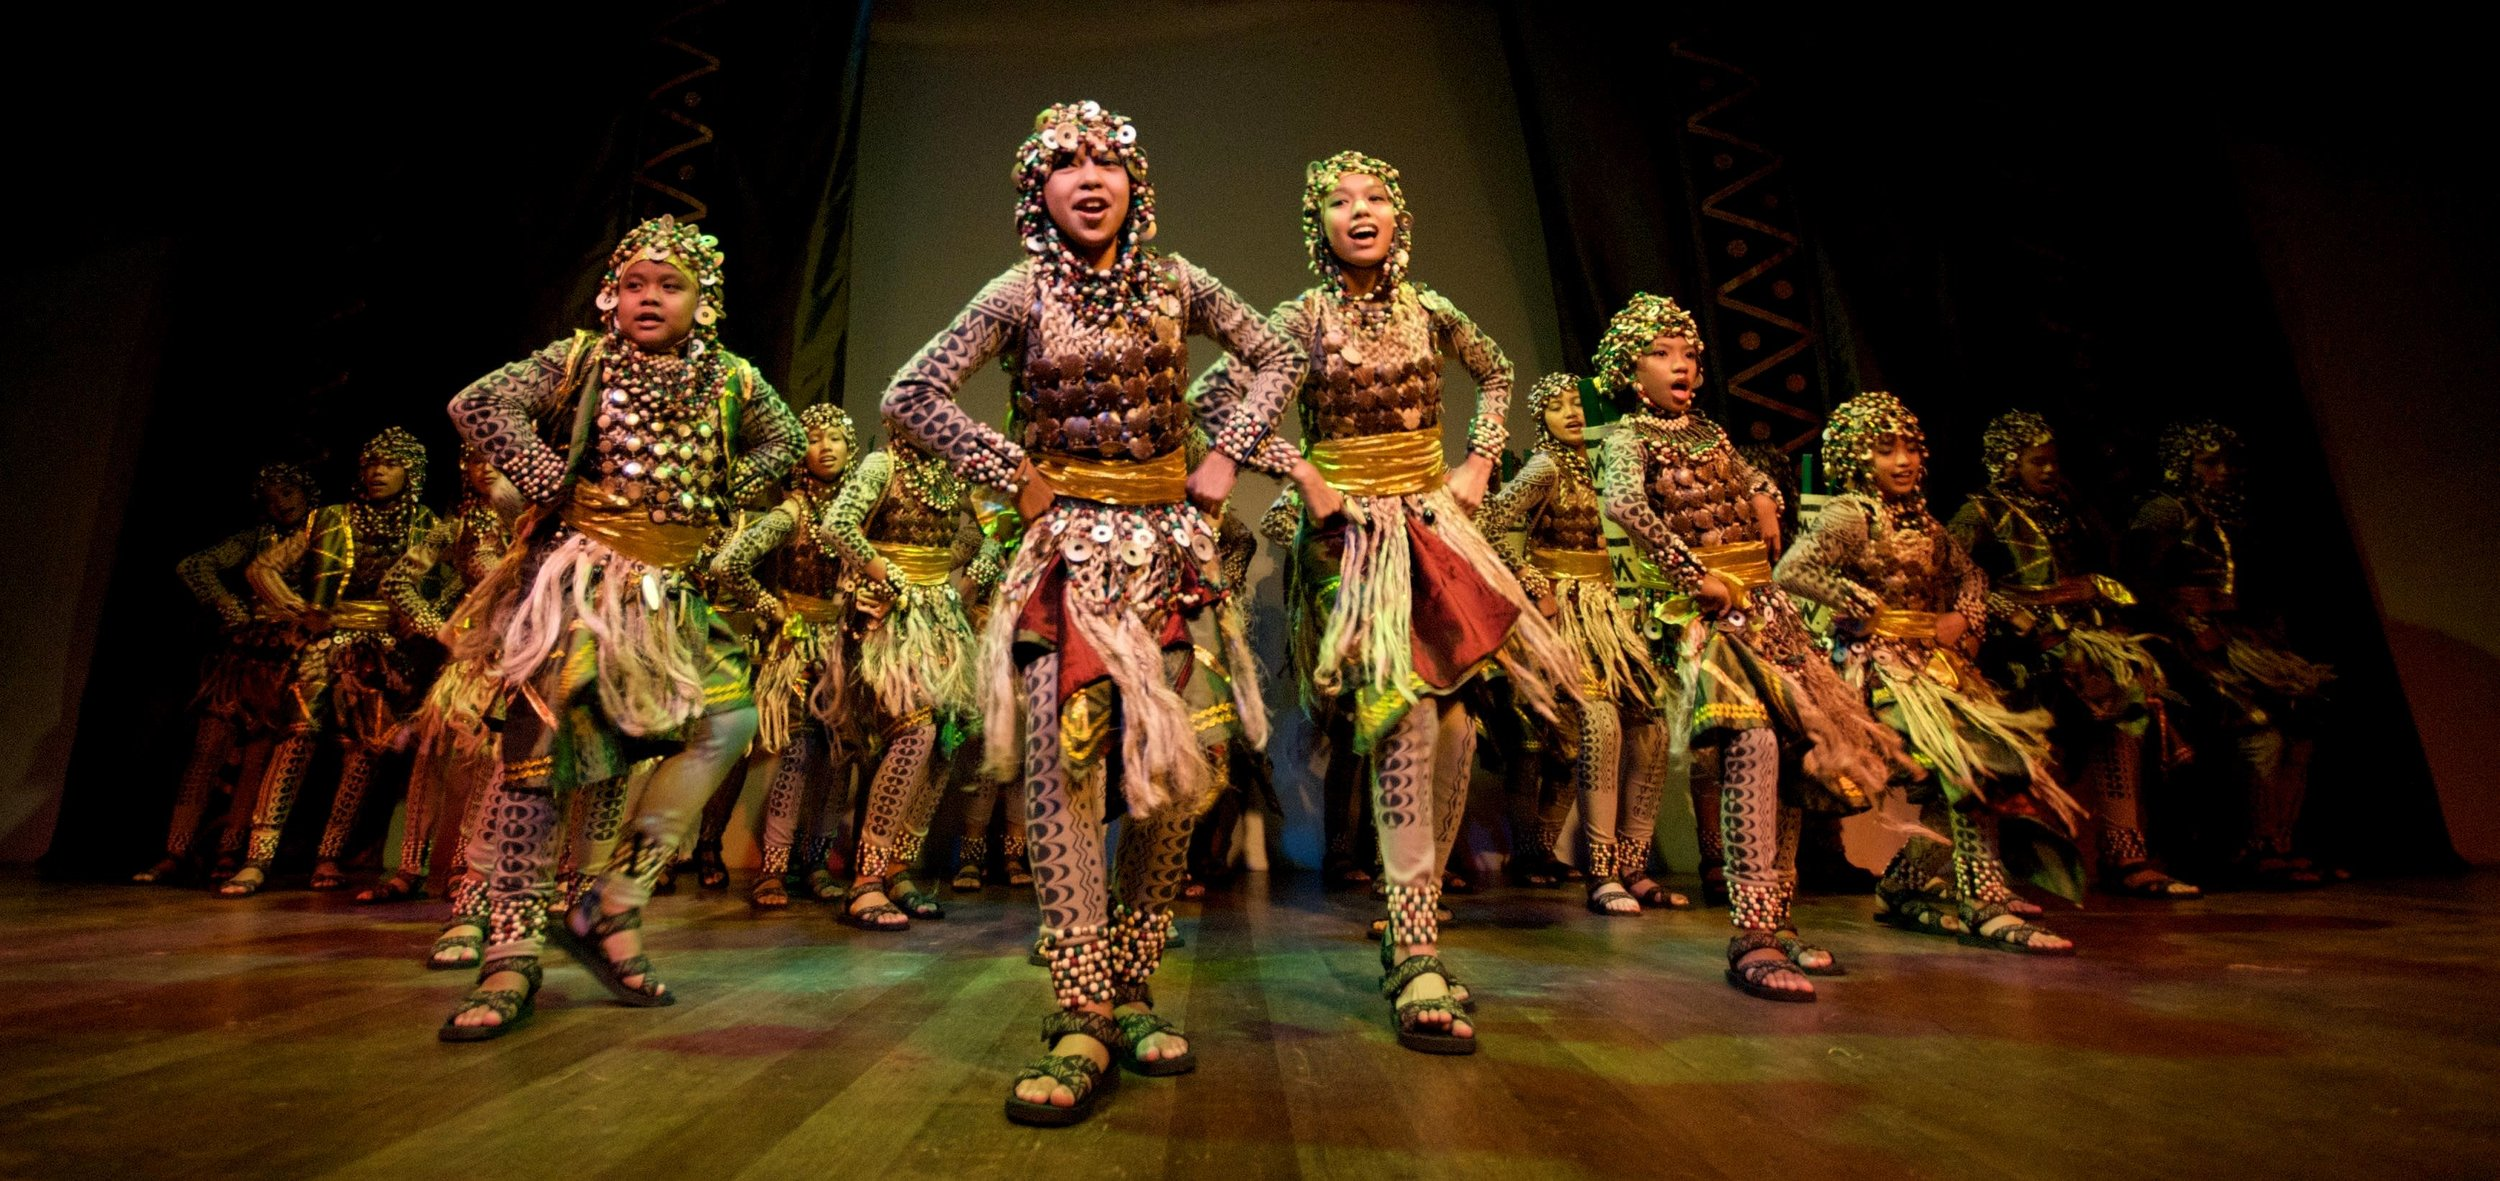 演出團隊  曼達維兒童合唱團(菲律賓) Mandaue Children & Youth Chorus(The Philippines)